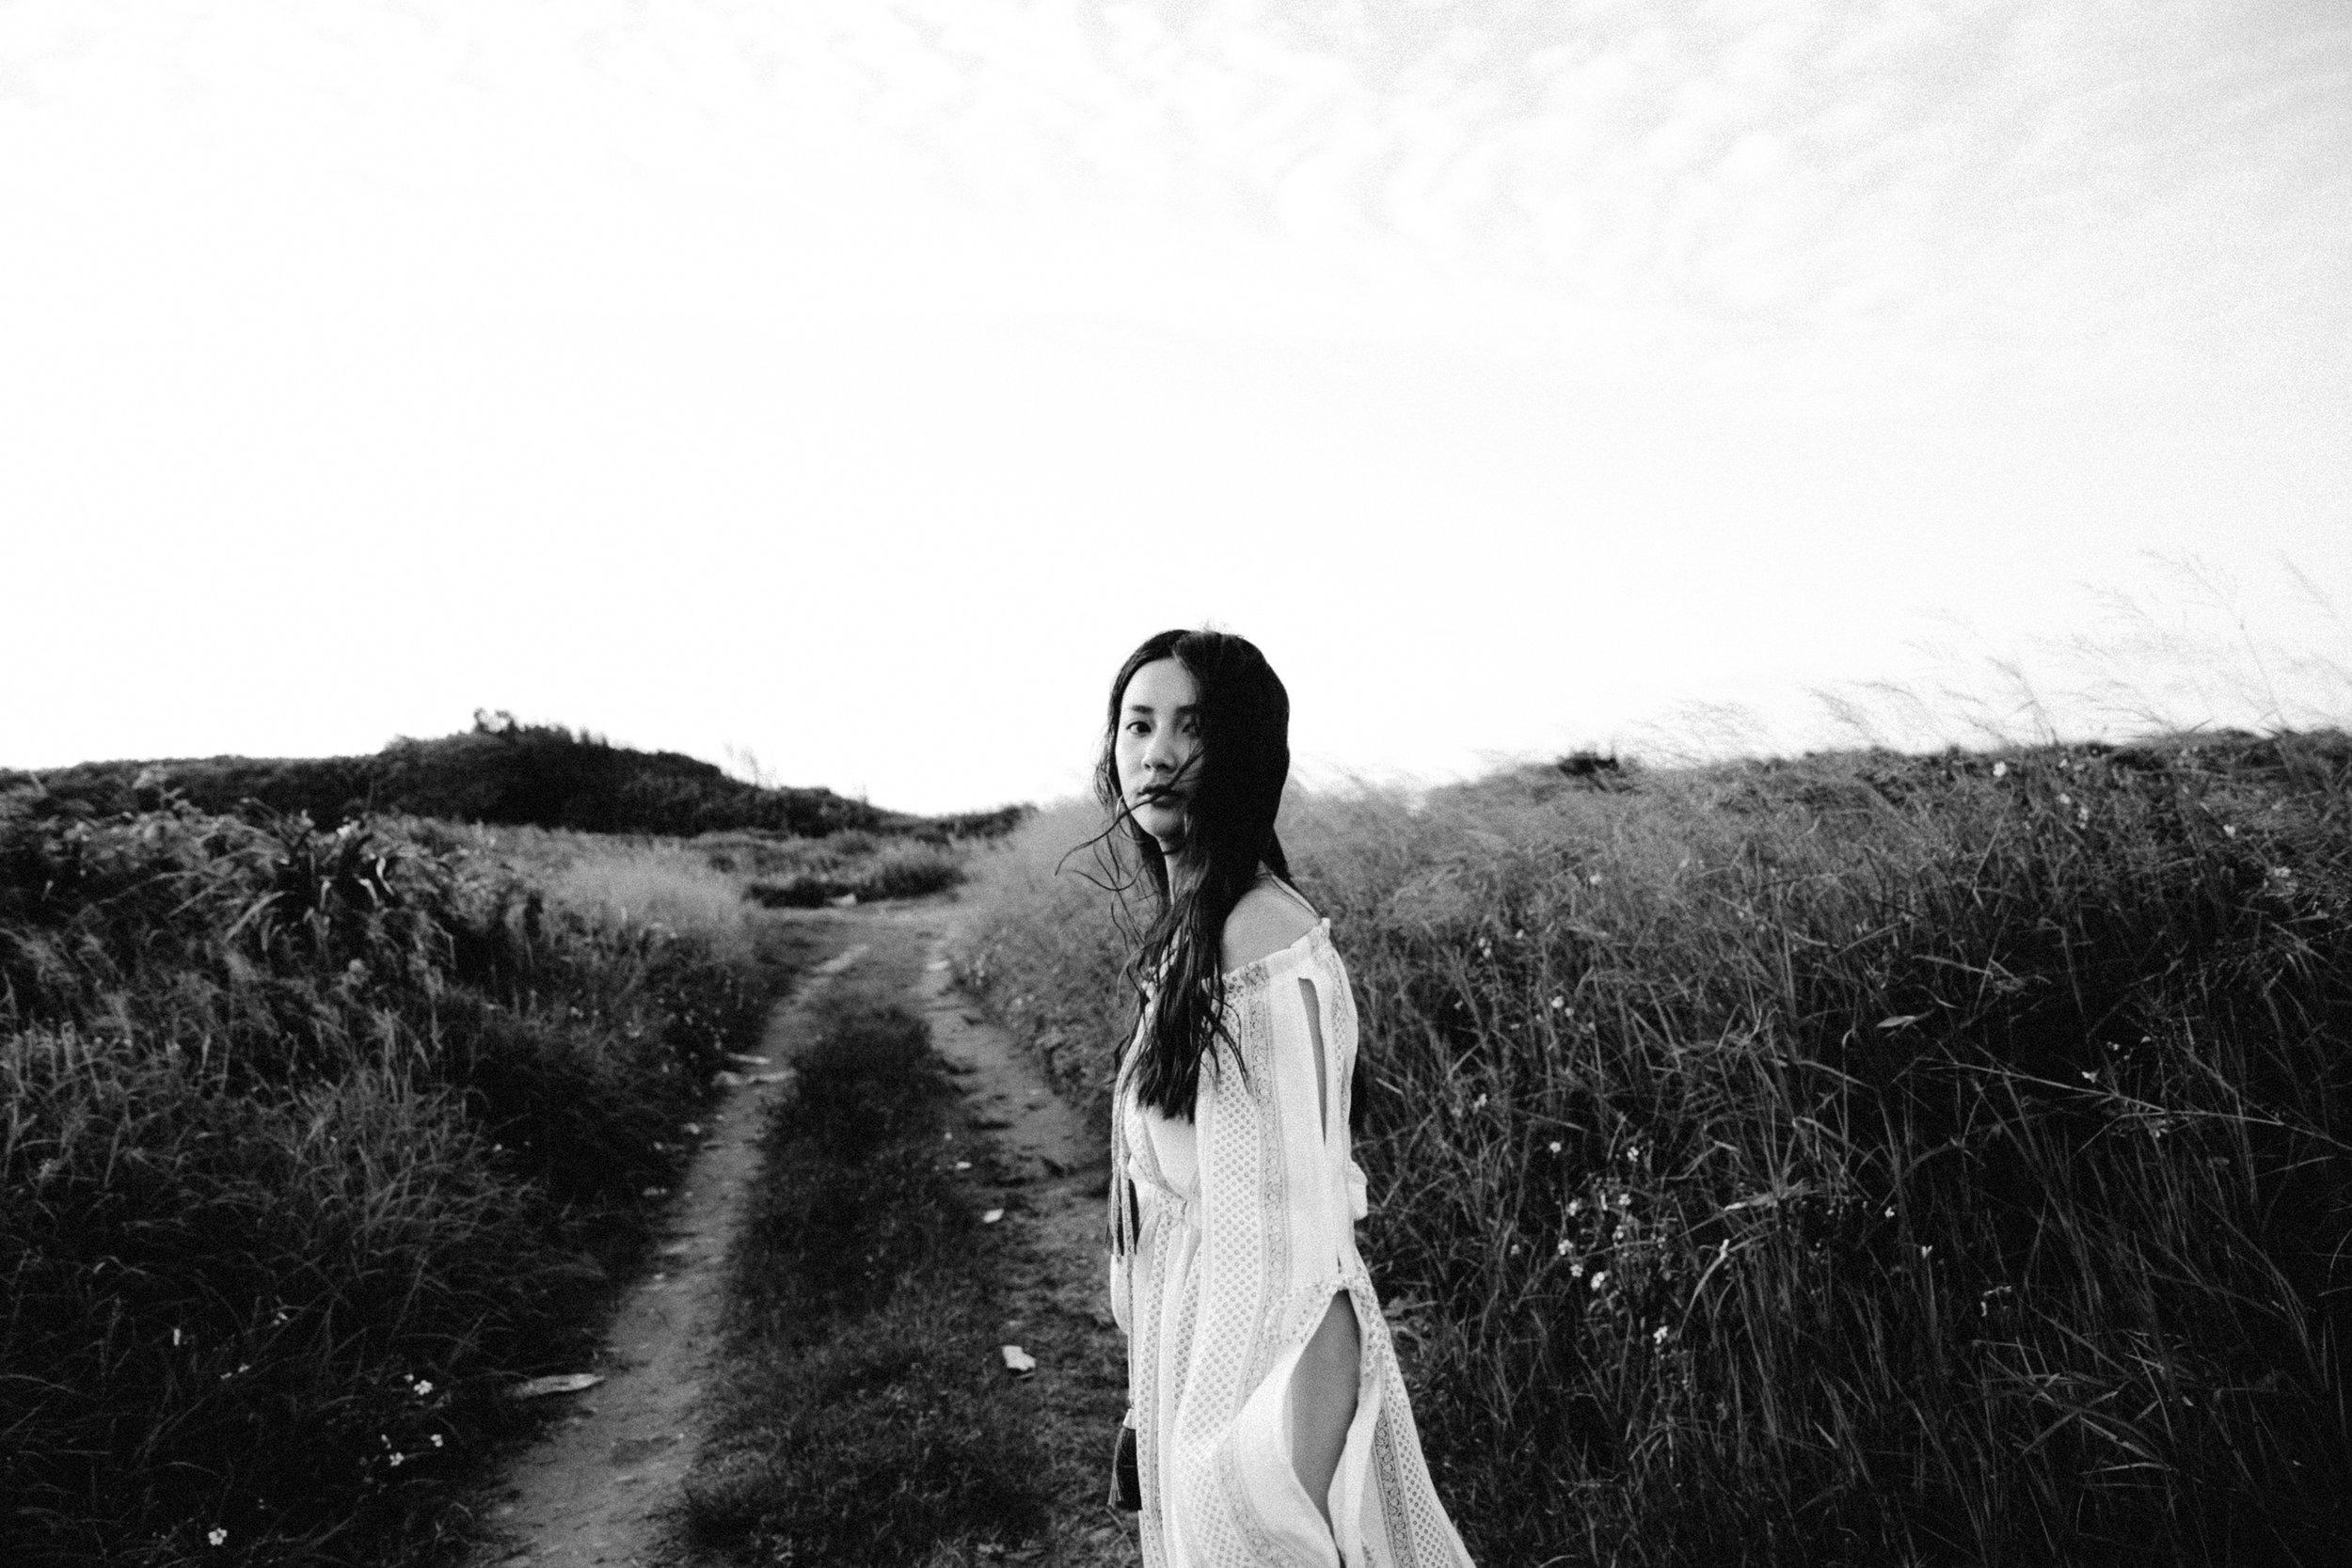 portrait-jane-girl-寫真-許厝港-桃園-30.jpg